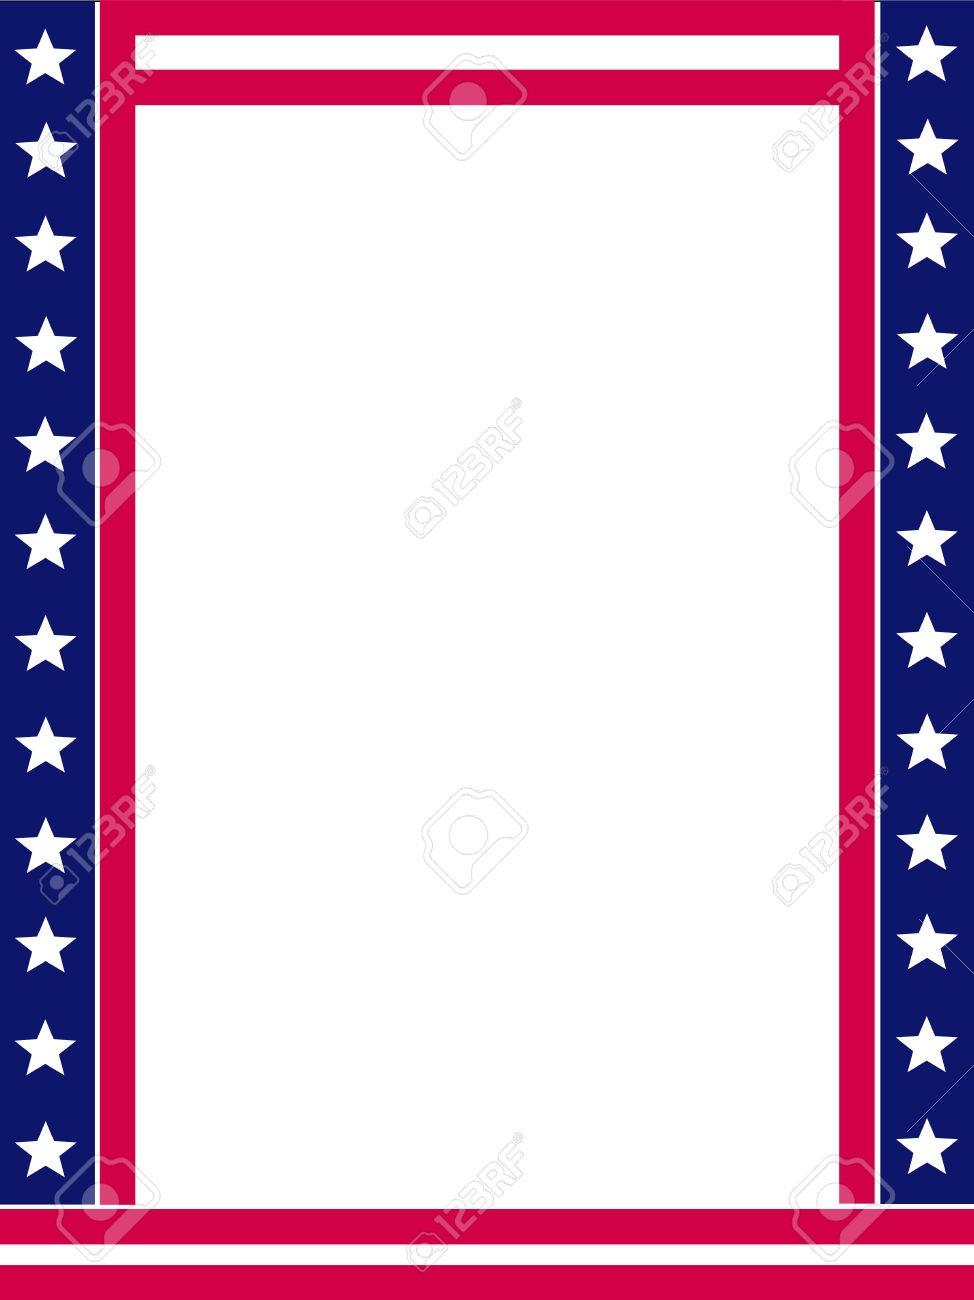 Patriotic Page Borders | Free Download Best Patriotic Page Borders - Free Printable 4Th Of July Stationery